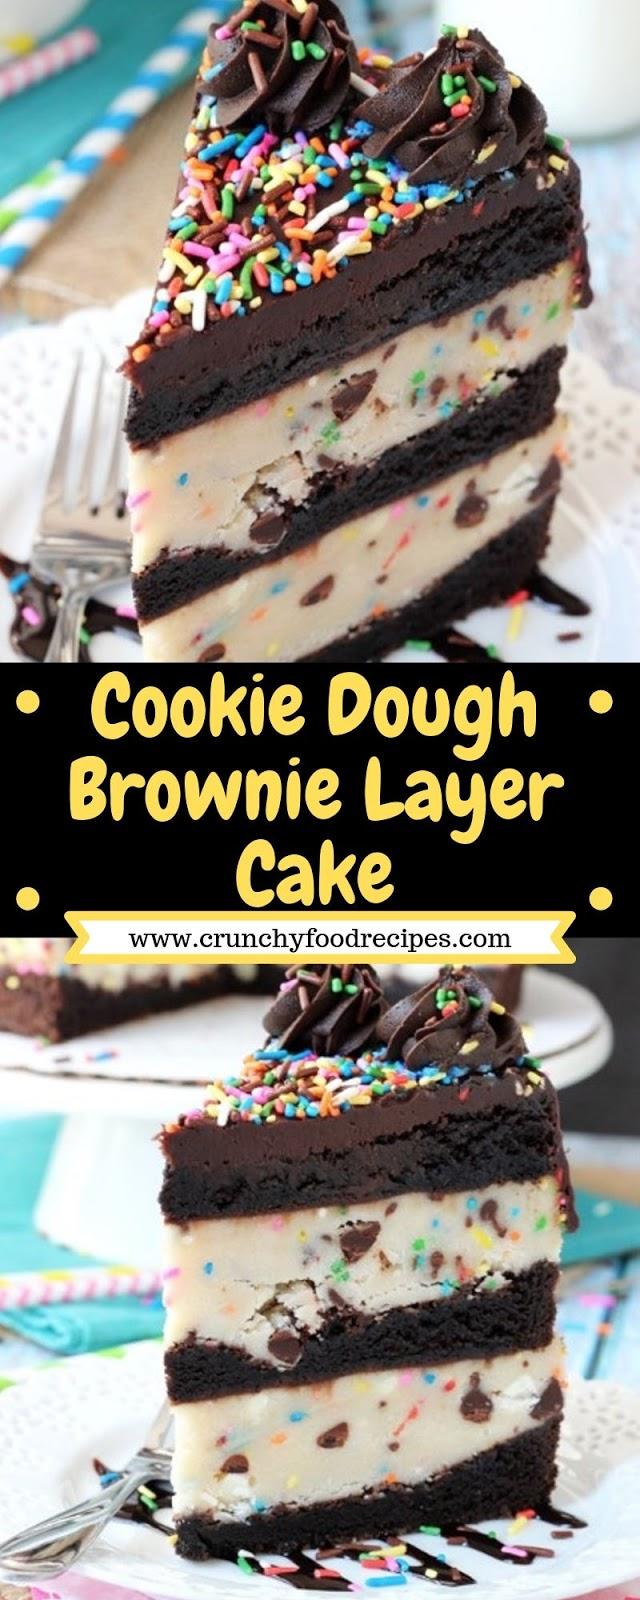 Cookie Dough Brownie Layer Cake